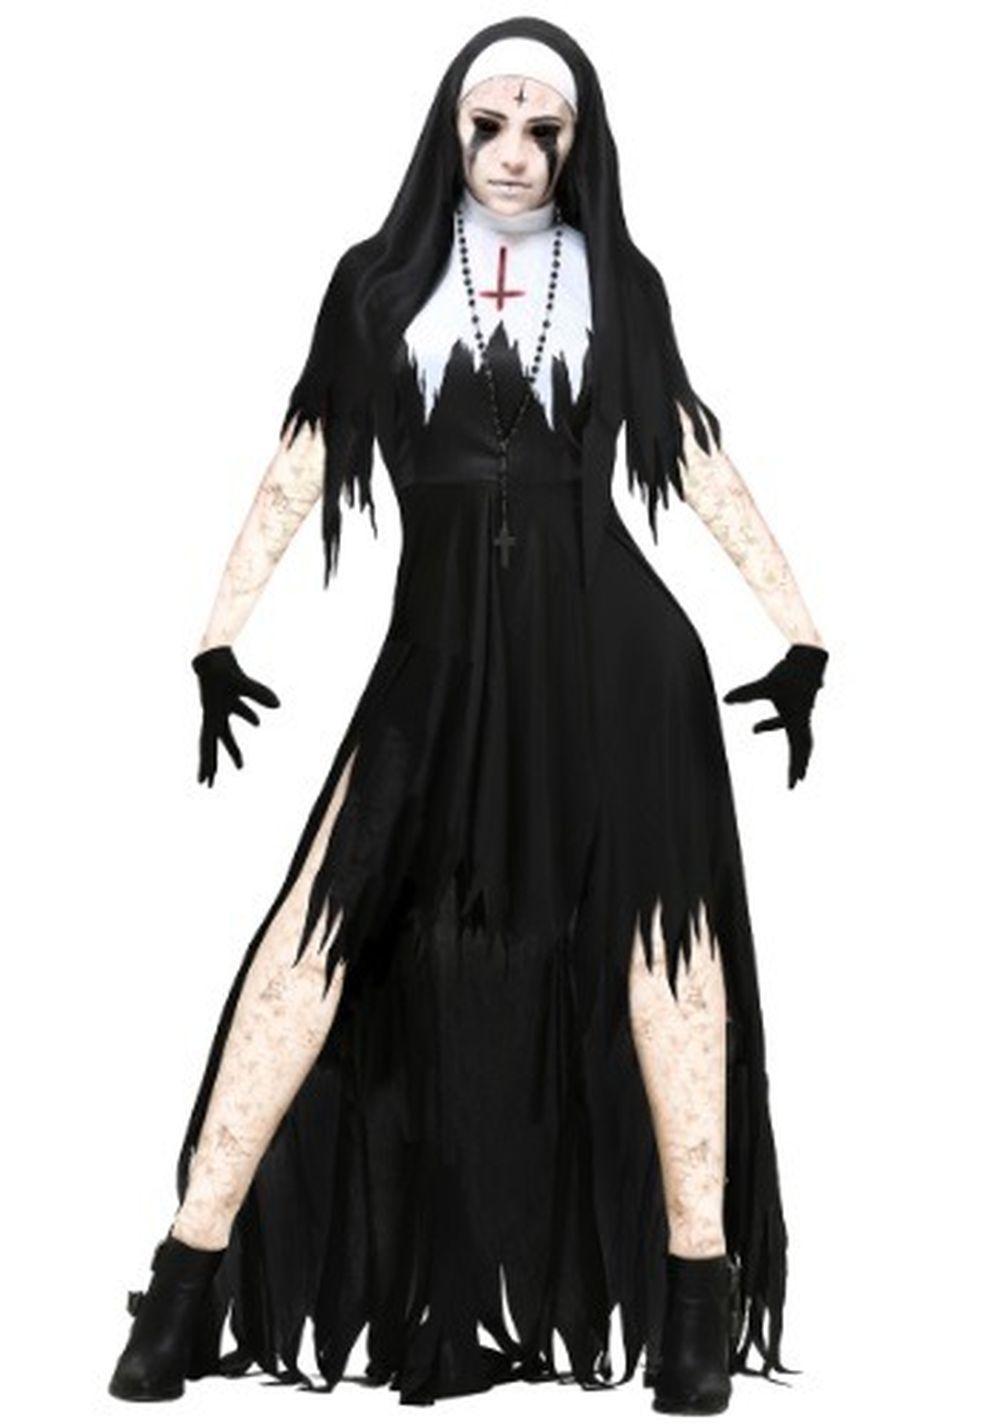 92b033c9d3ba Breathtaking 51 Scary DIY Halloween Costumes for Women  HatsForWomenBowler